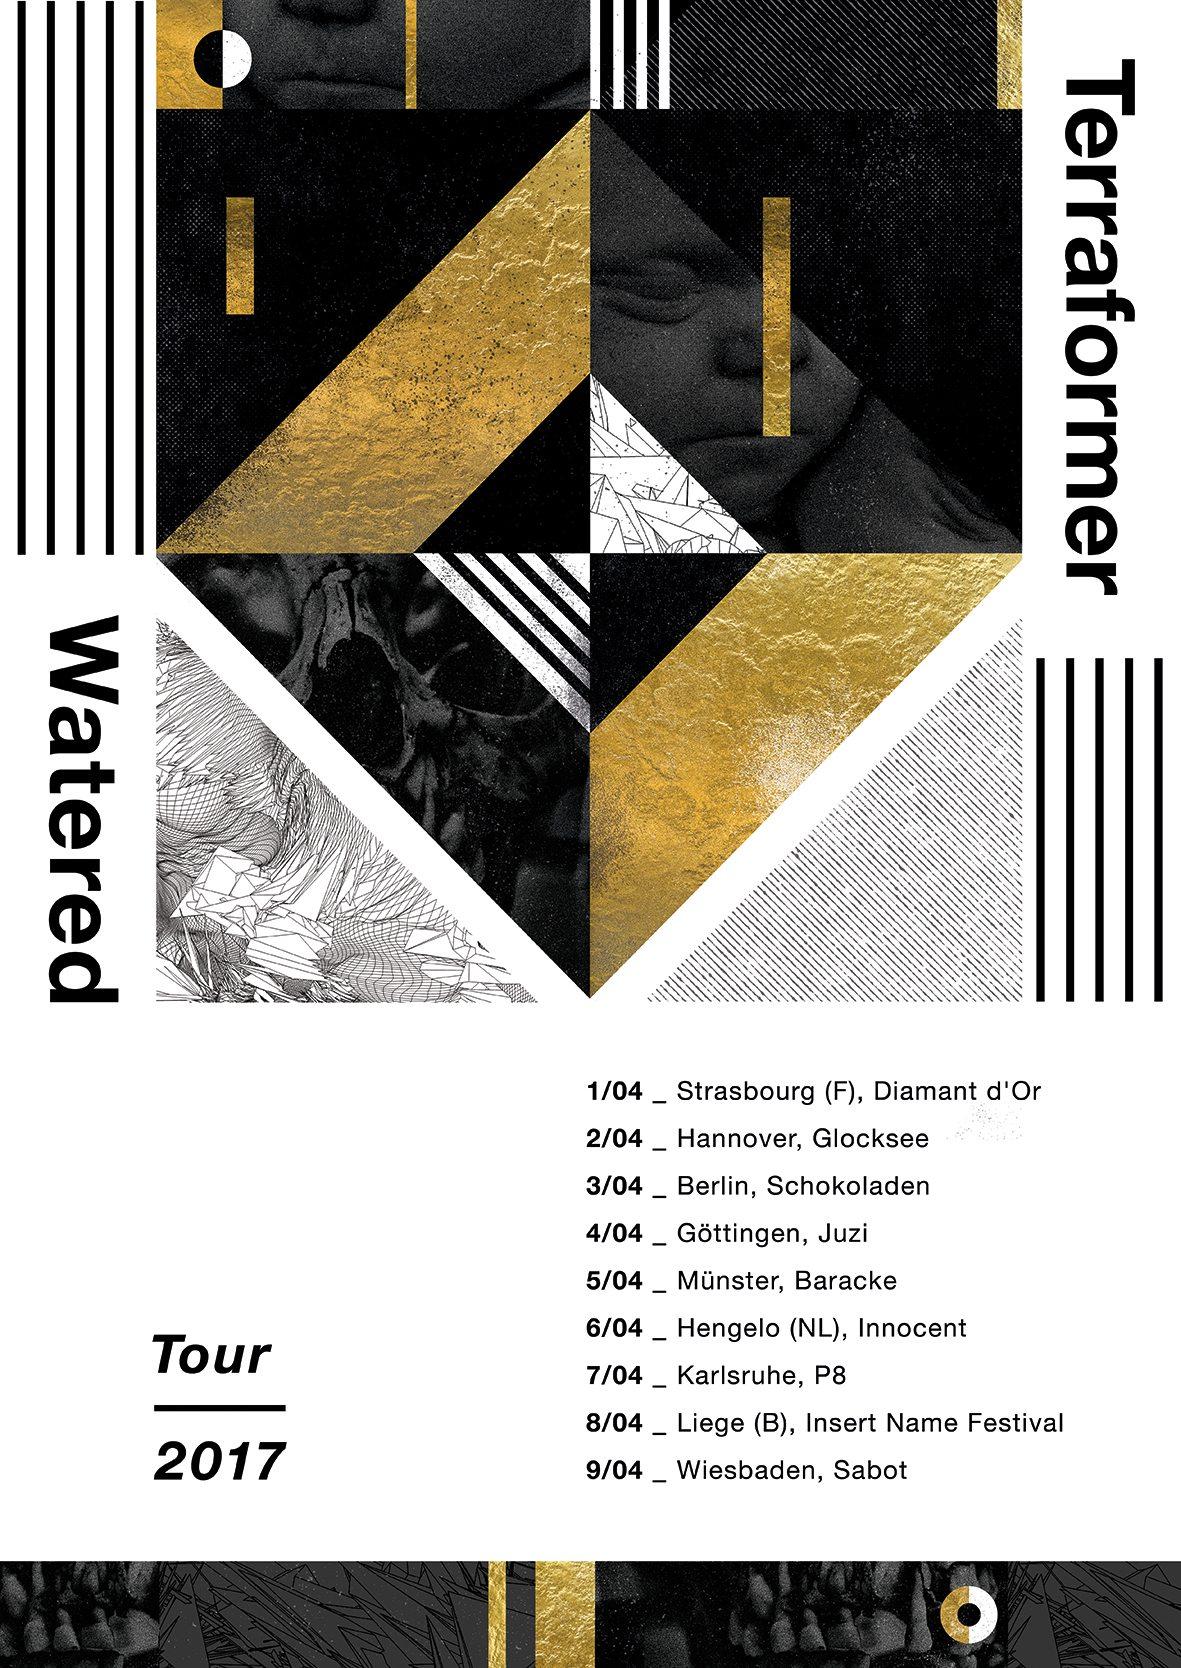 Terraformer / Watered EU Tour